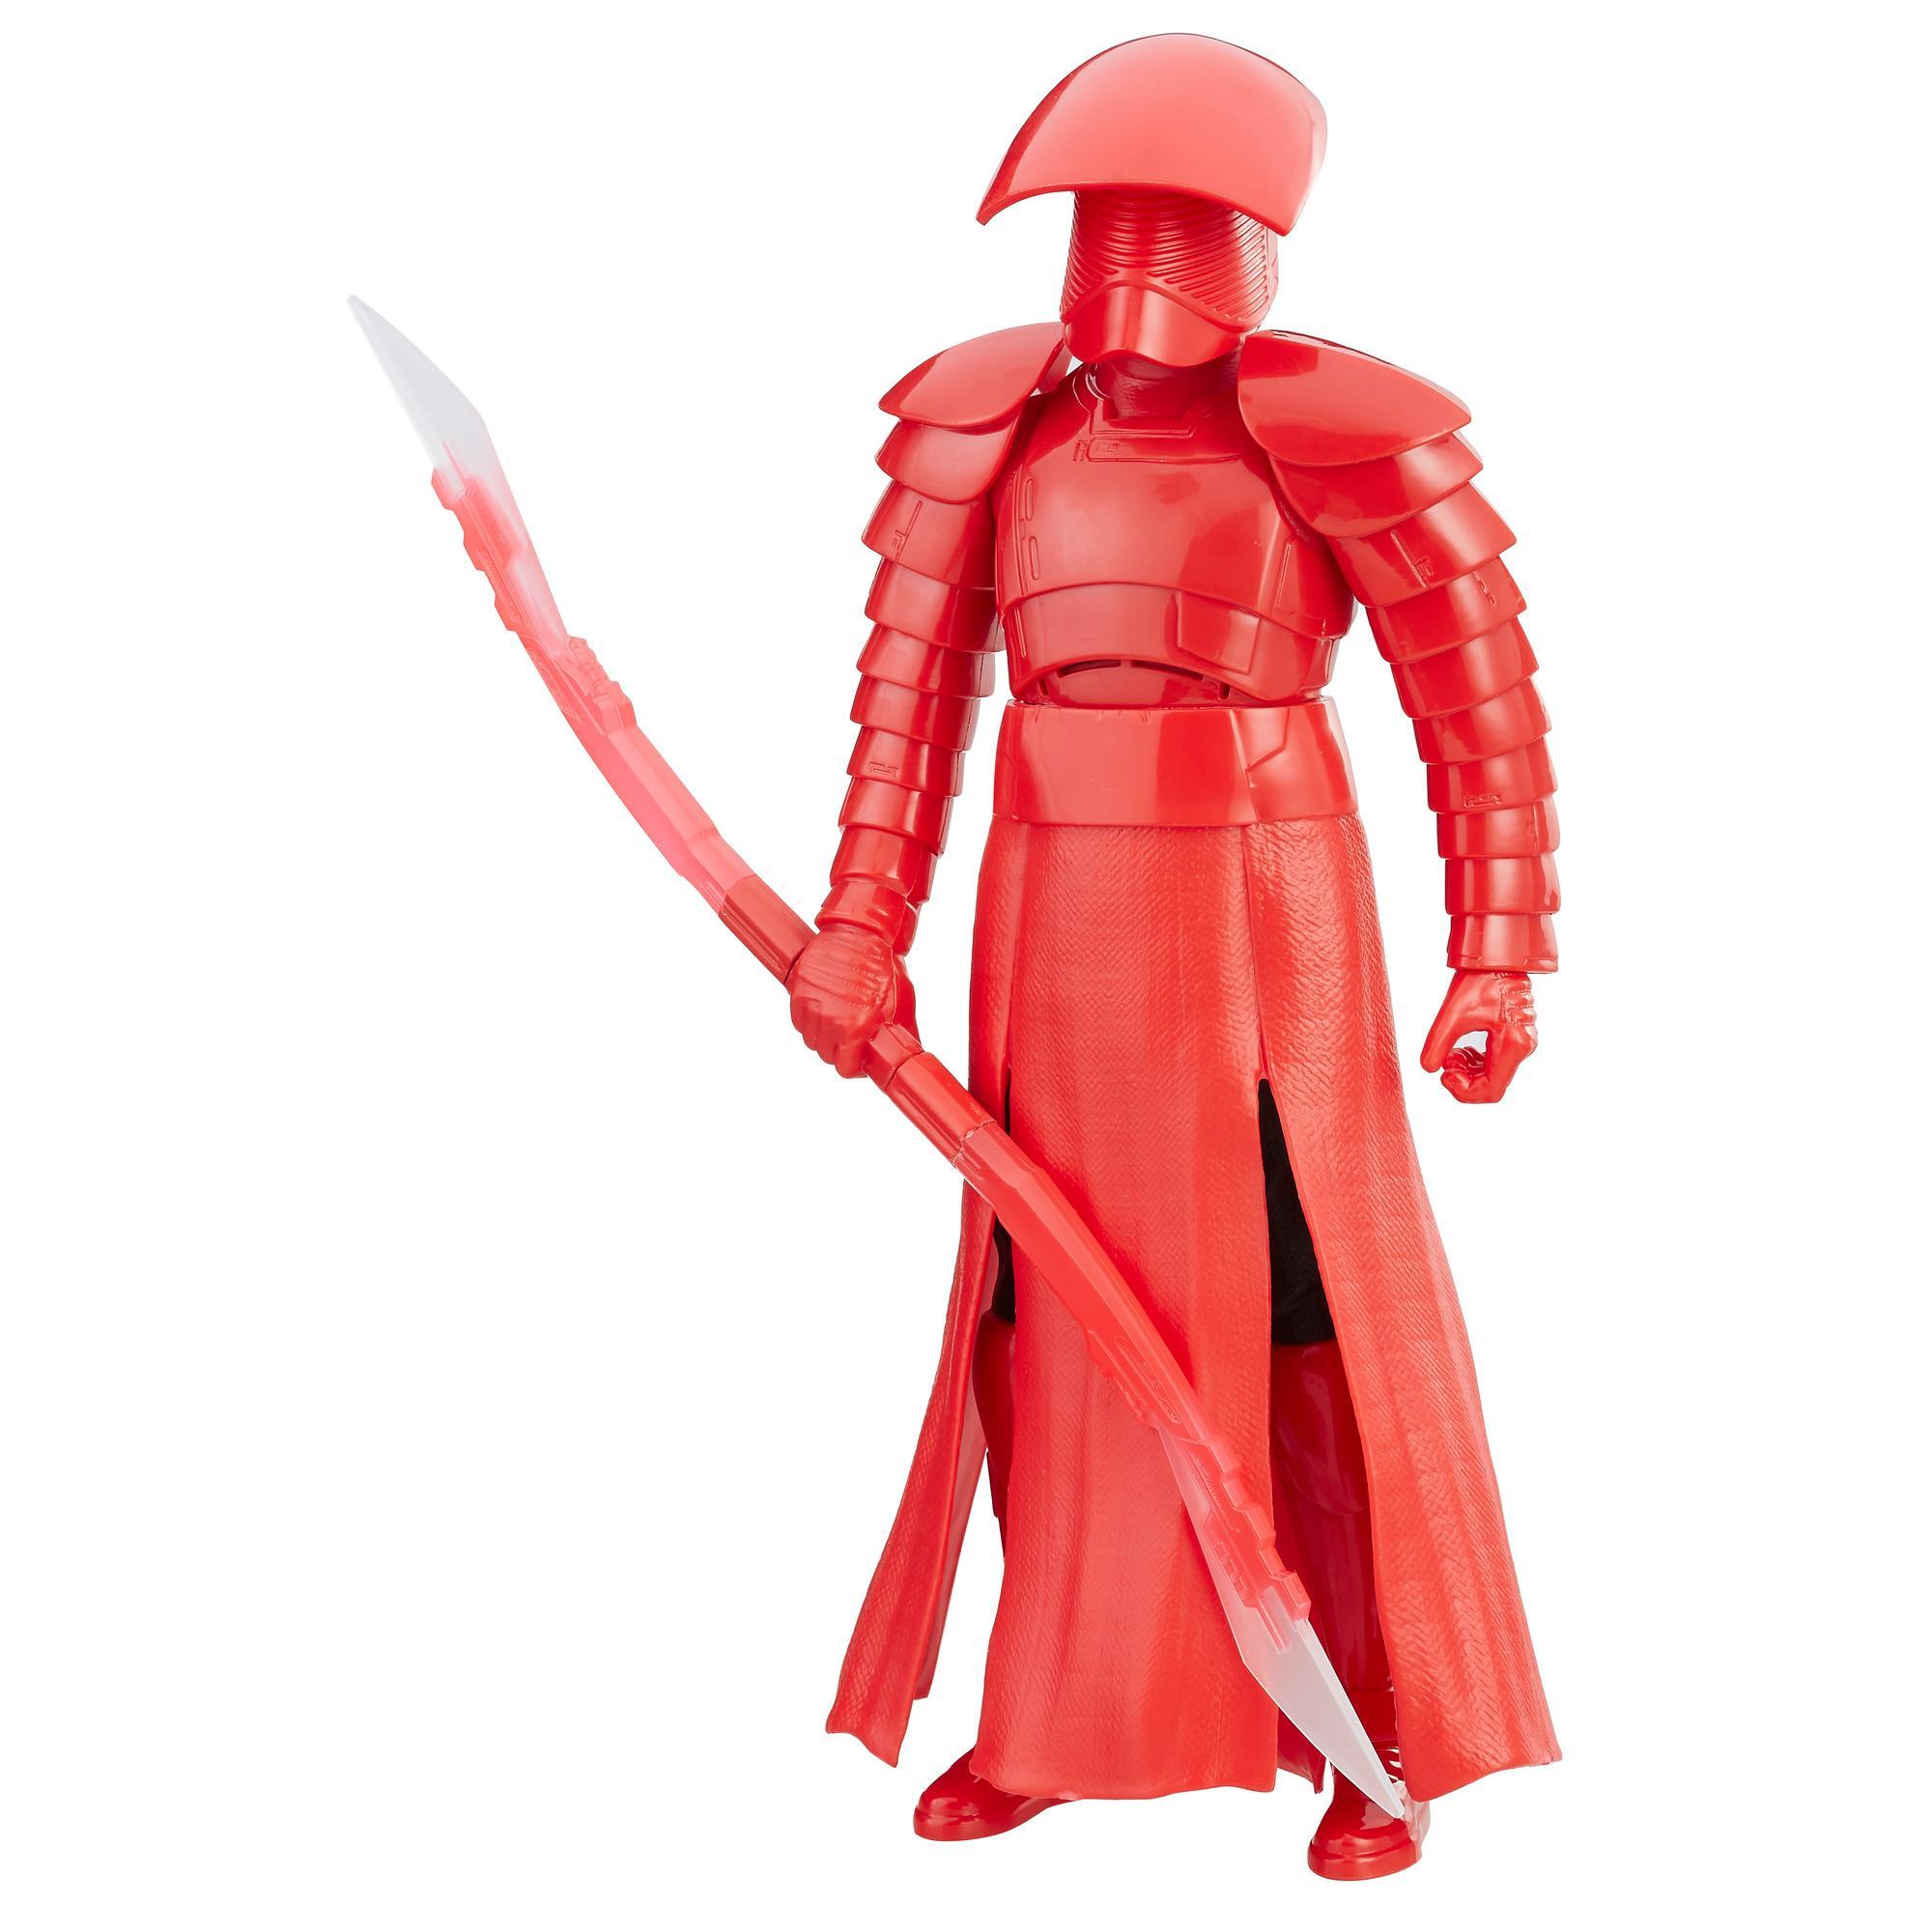 Star Wars: The Last Jedi Electronic Duel Elite Praetorian Guard